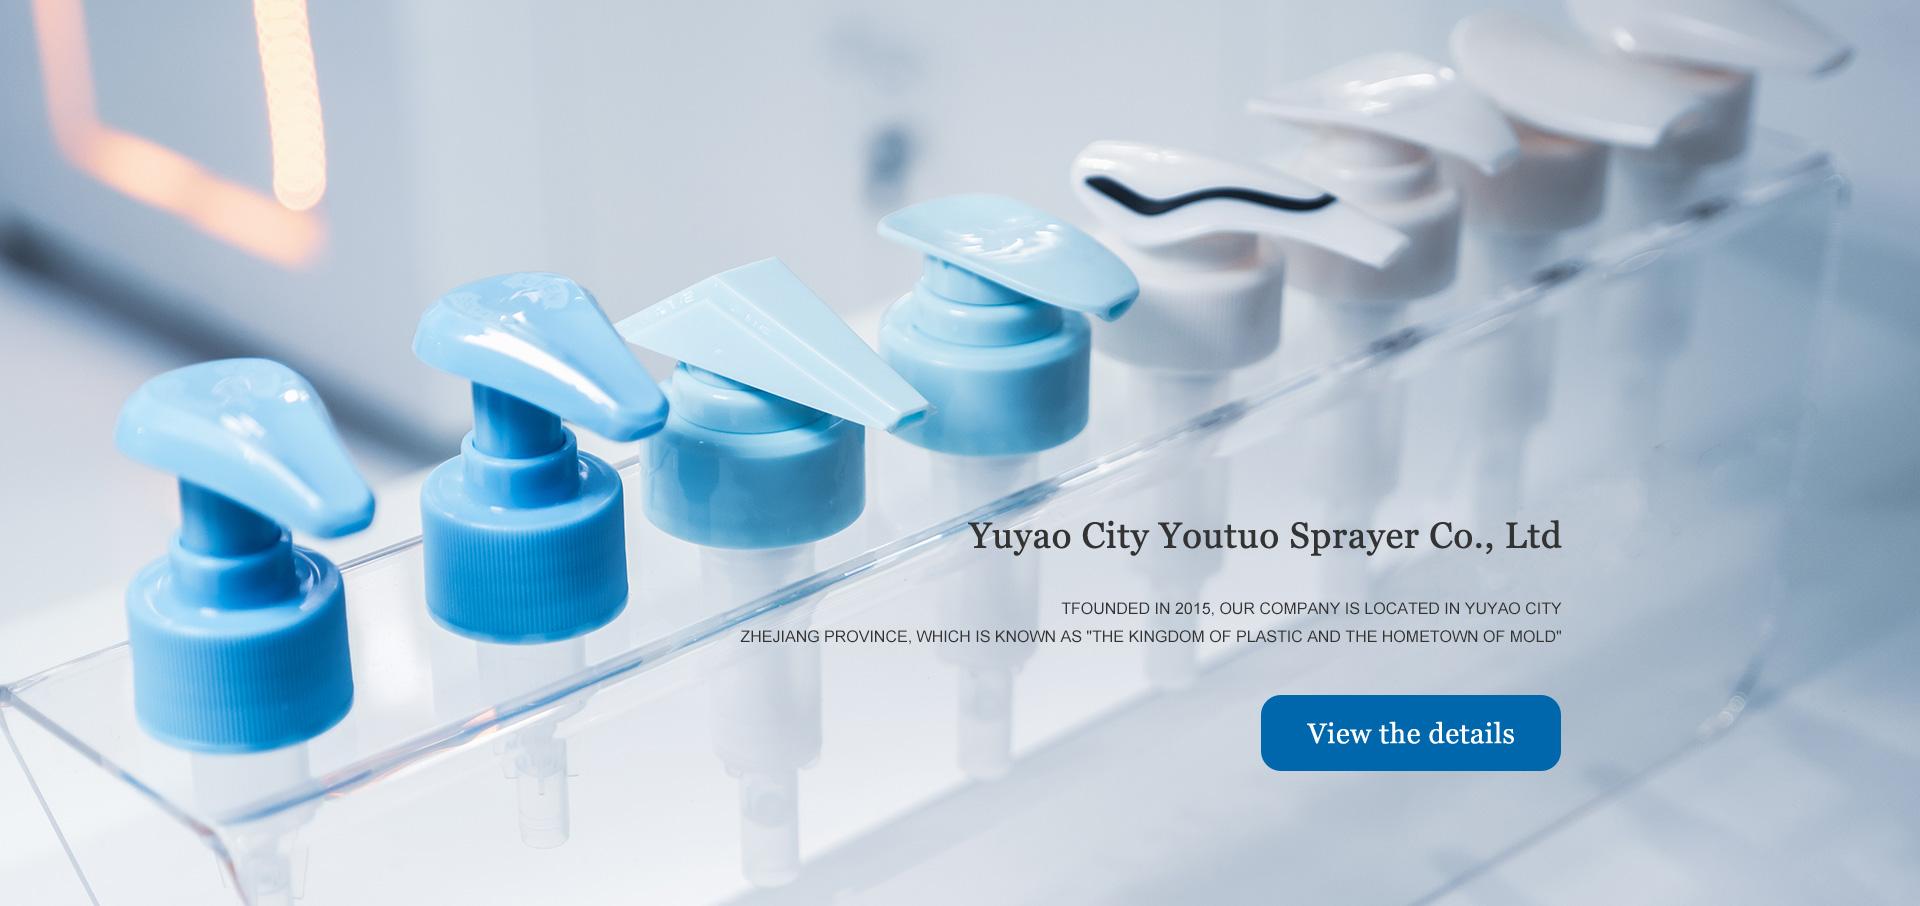 Yuyao City Youtuo Sprayer Co., Ltd